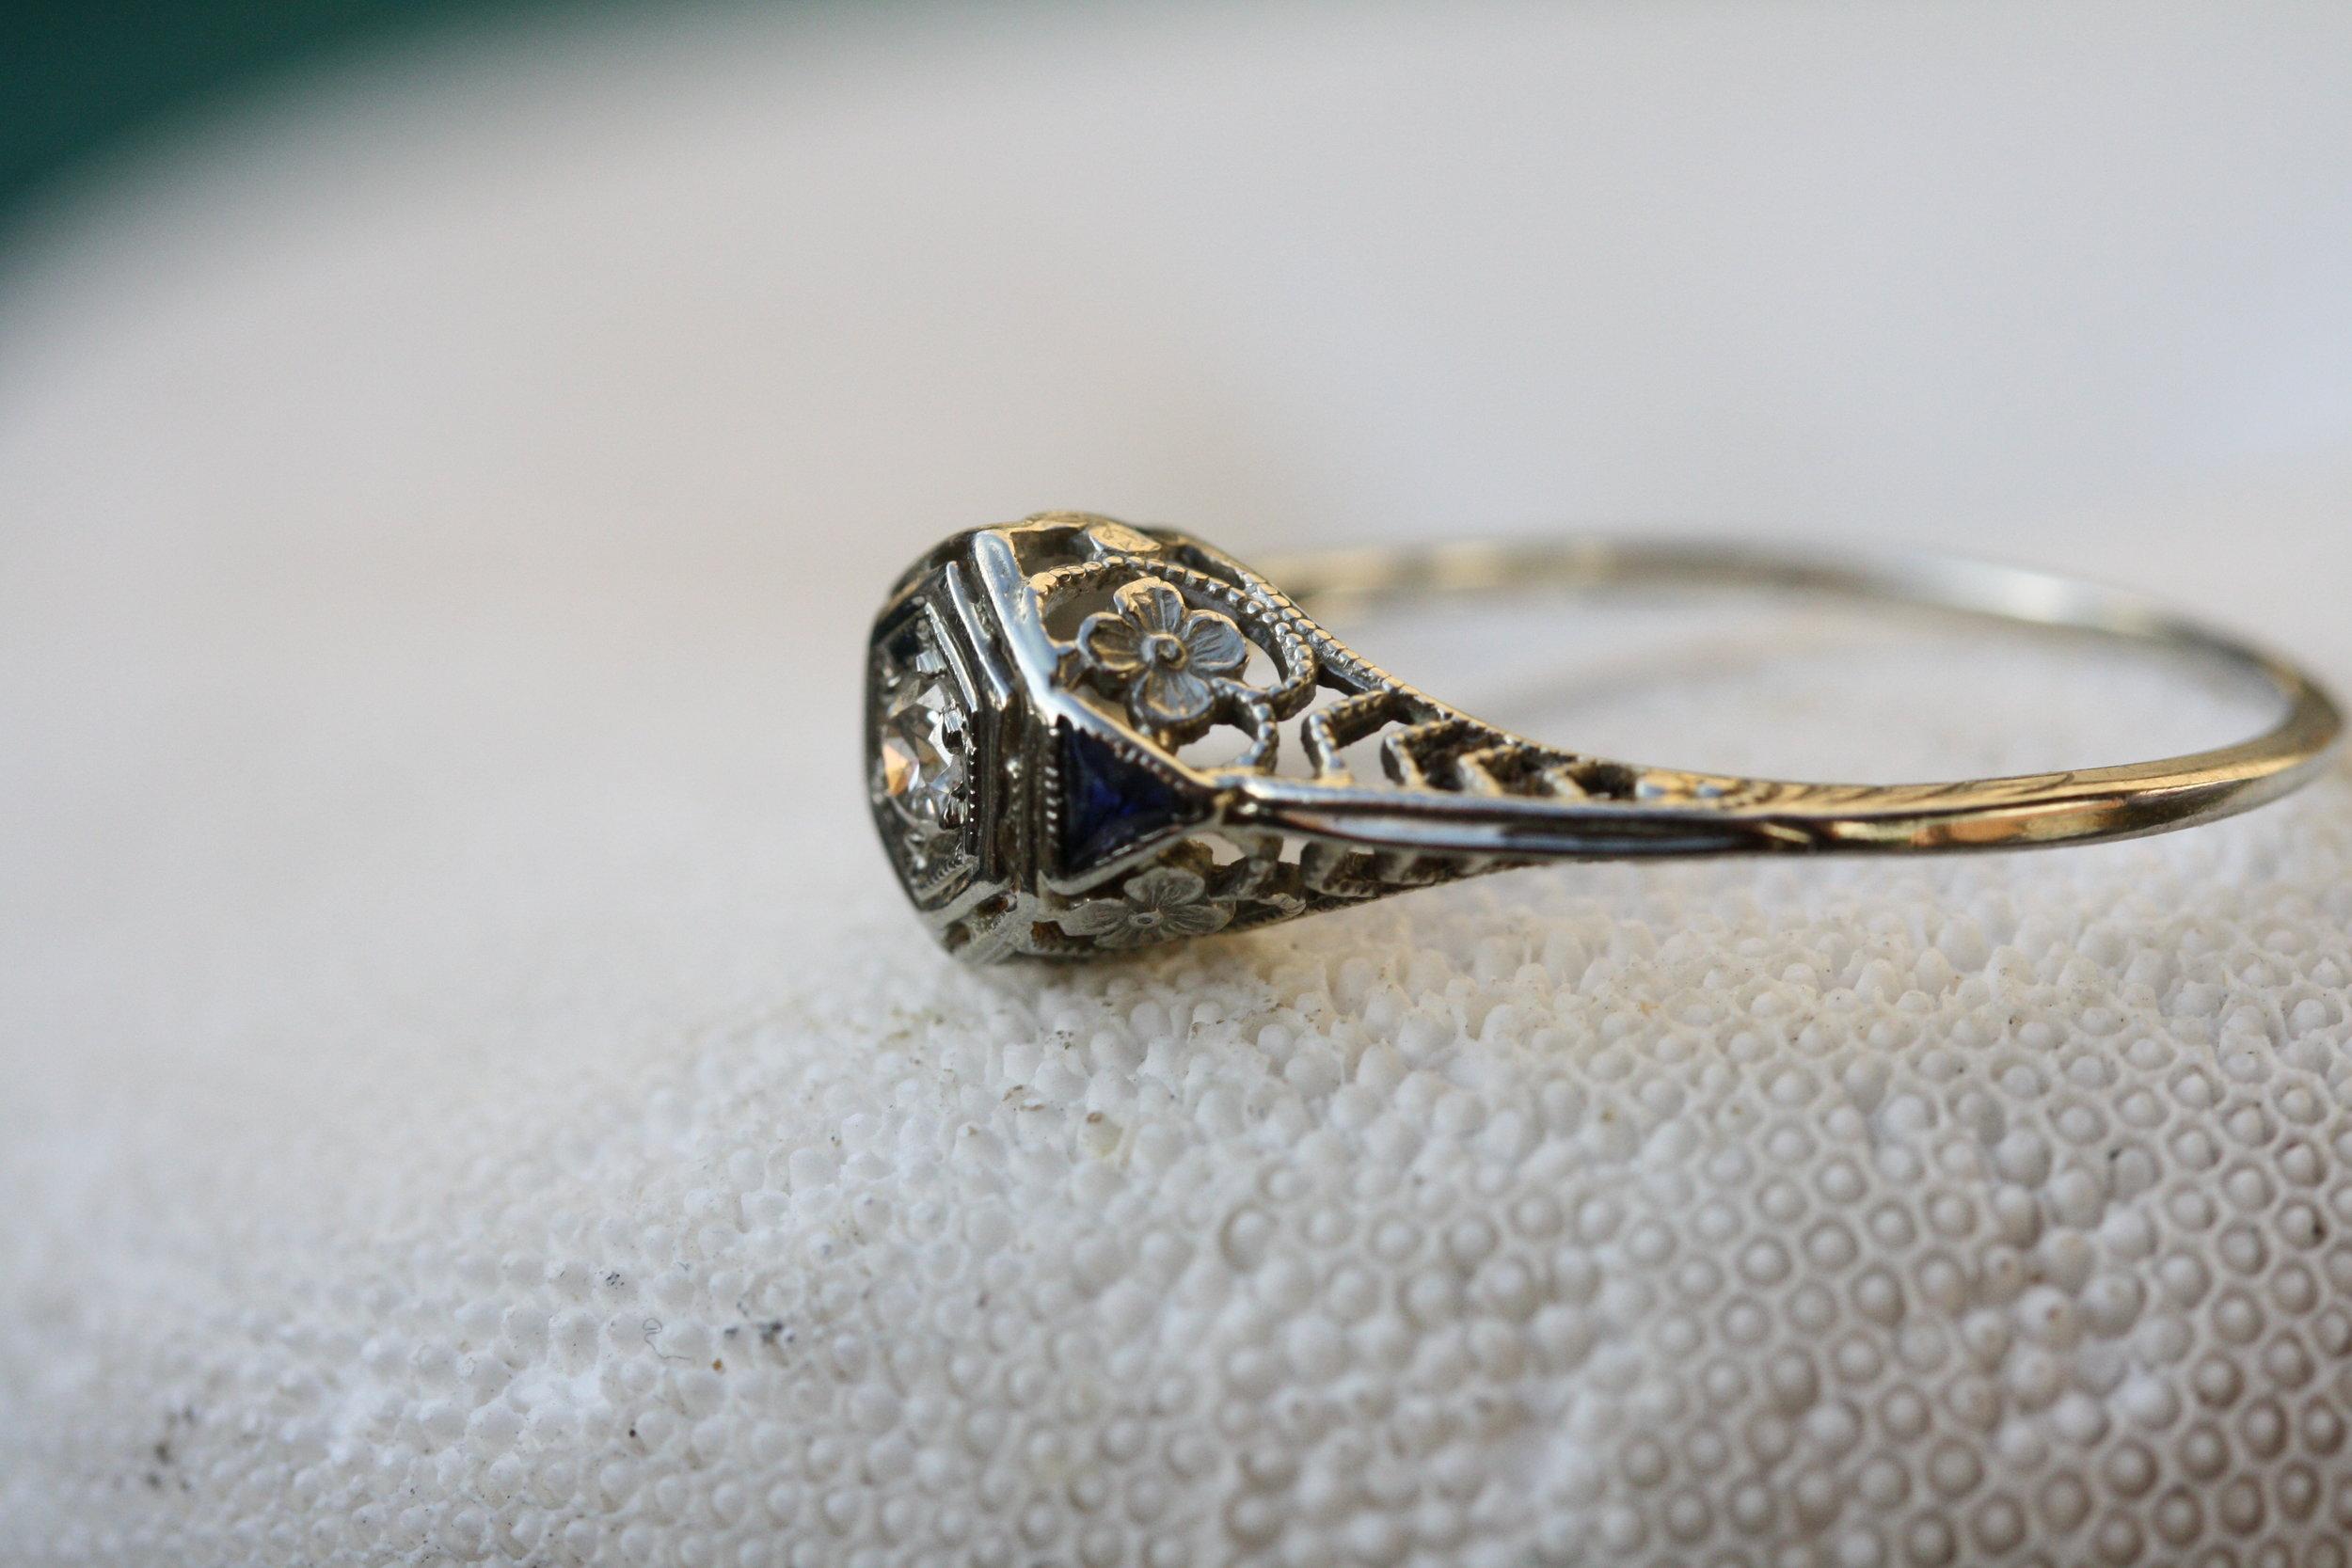 Estate Ring Diamond 2 Small Sapphires Floral Filligree_09 copy.JPG